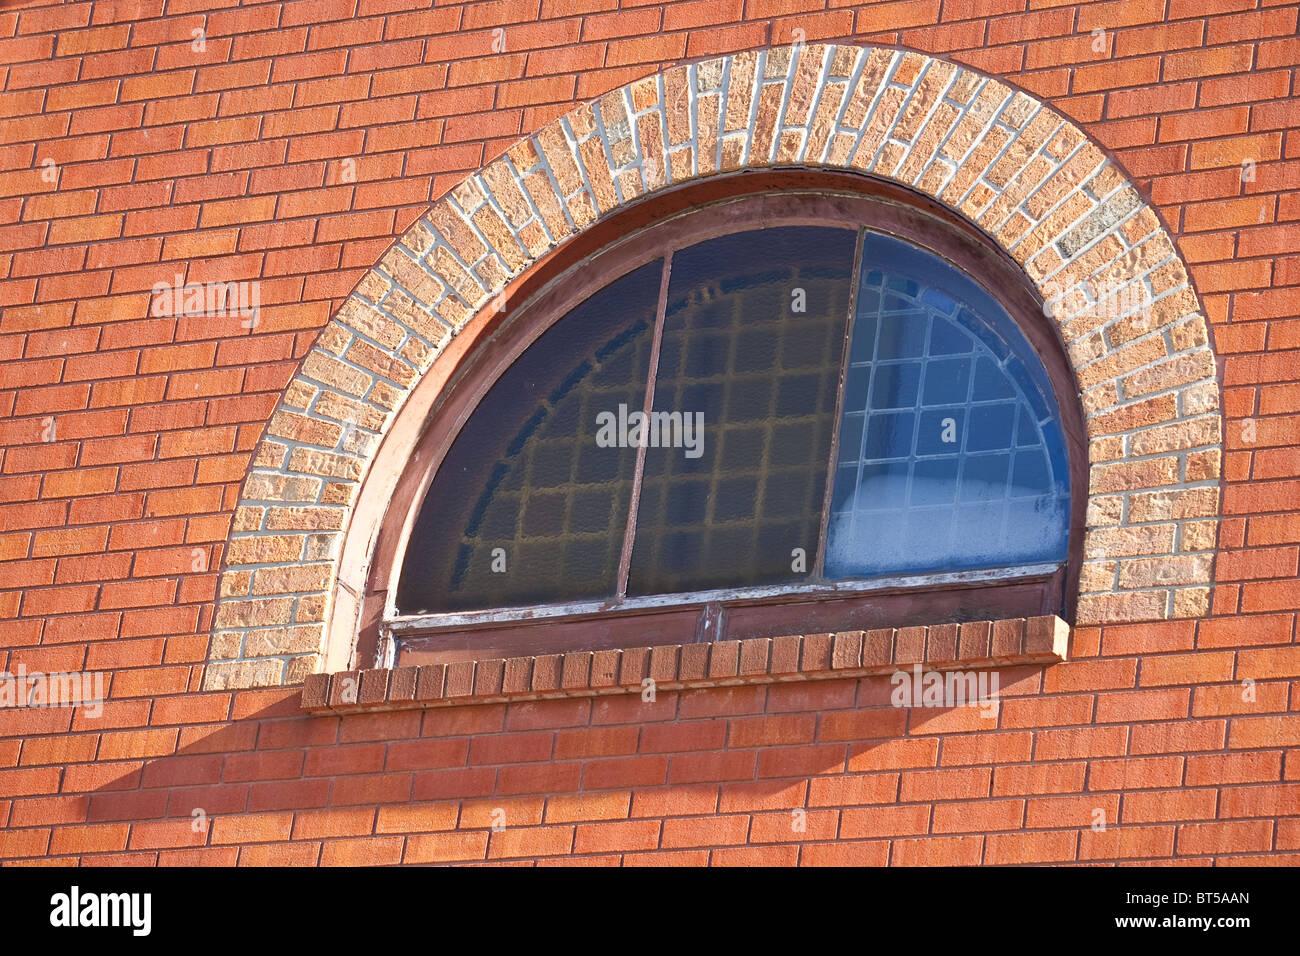 A Brick Wall Focus On A Half Moon Window Stock Photo Alamy